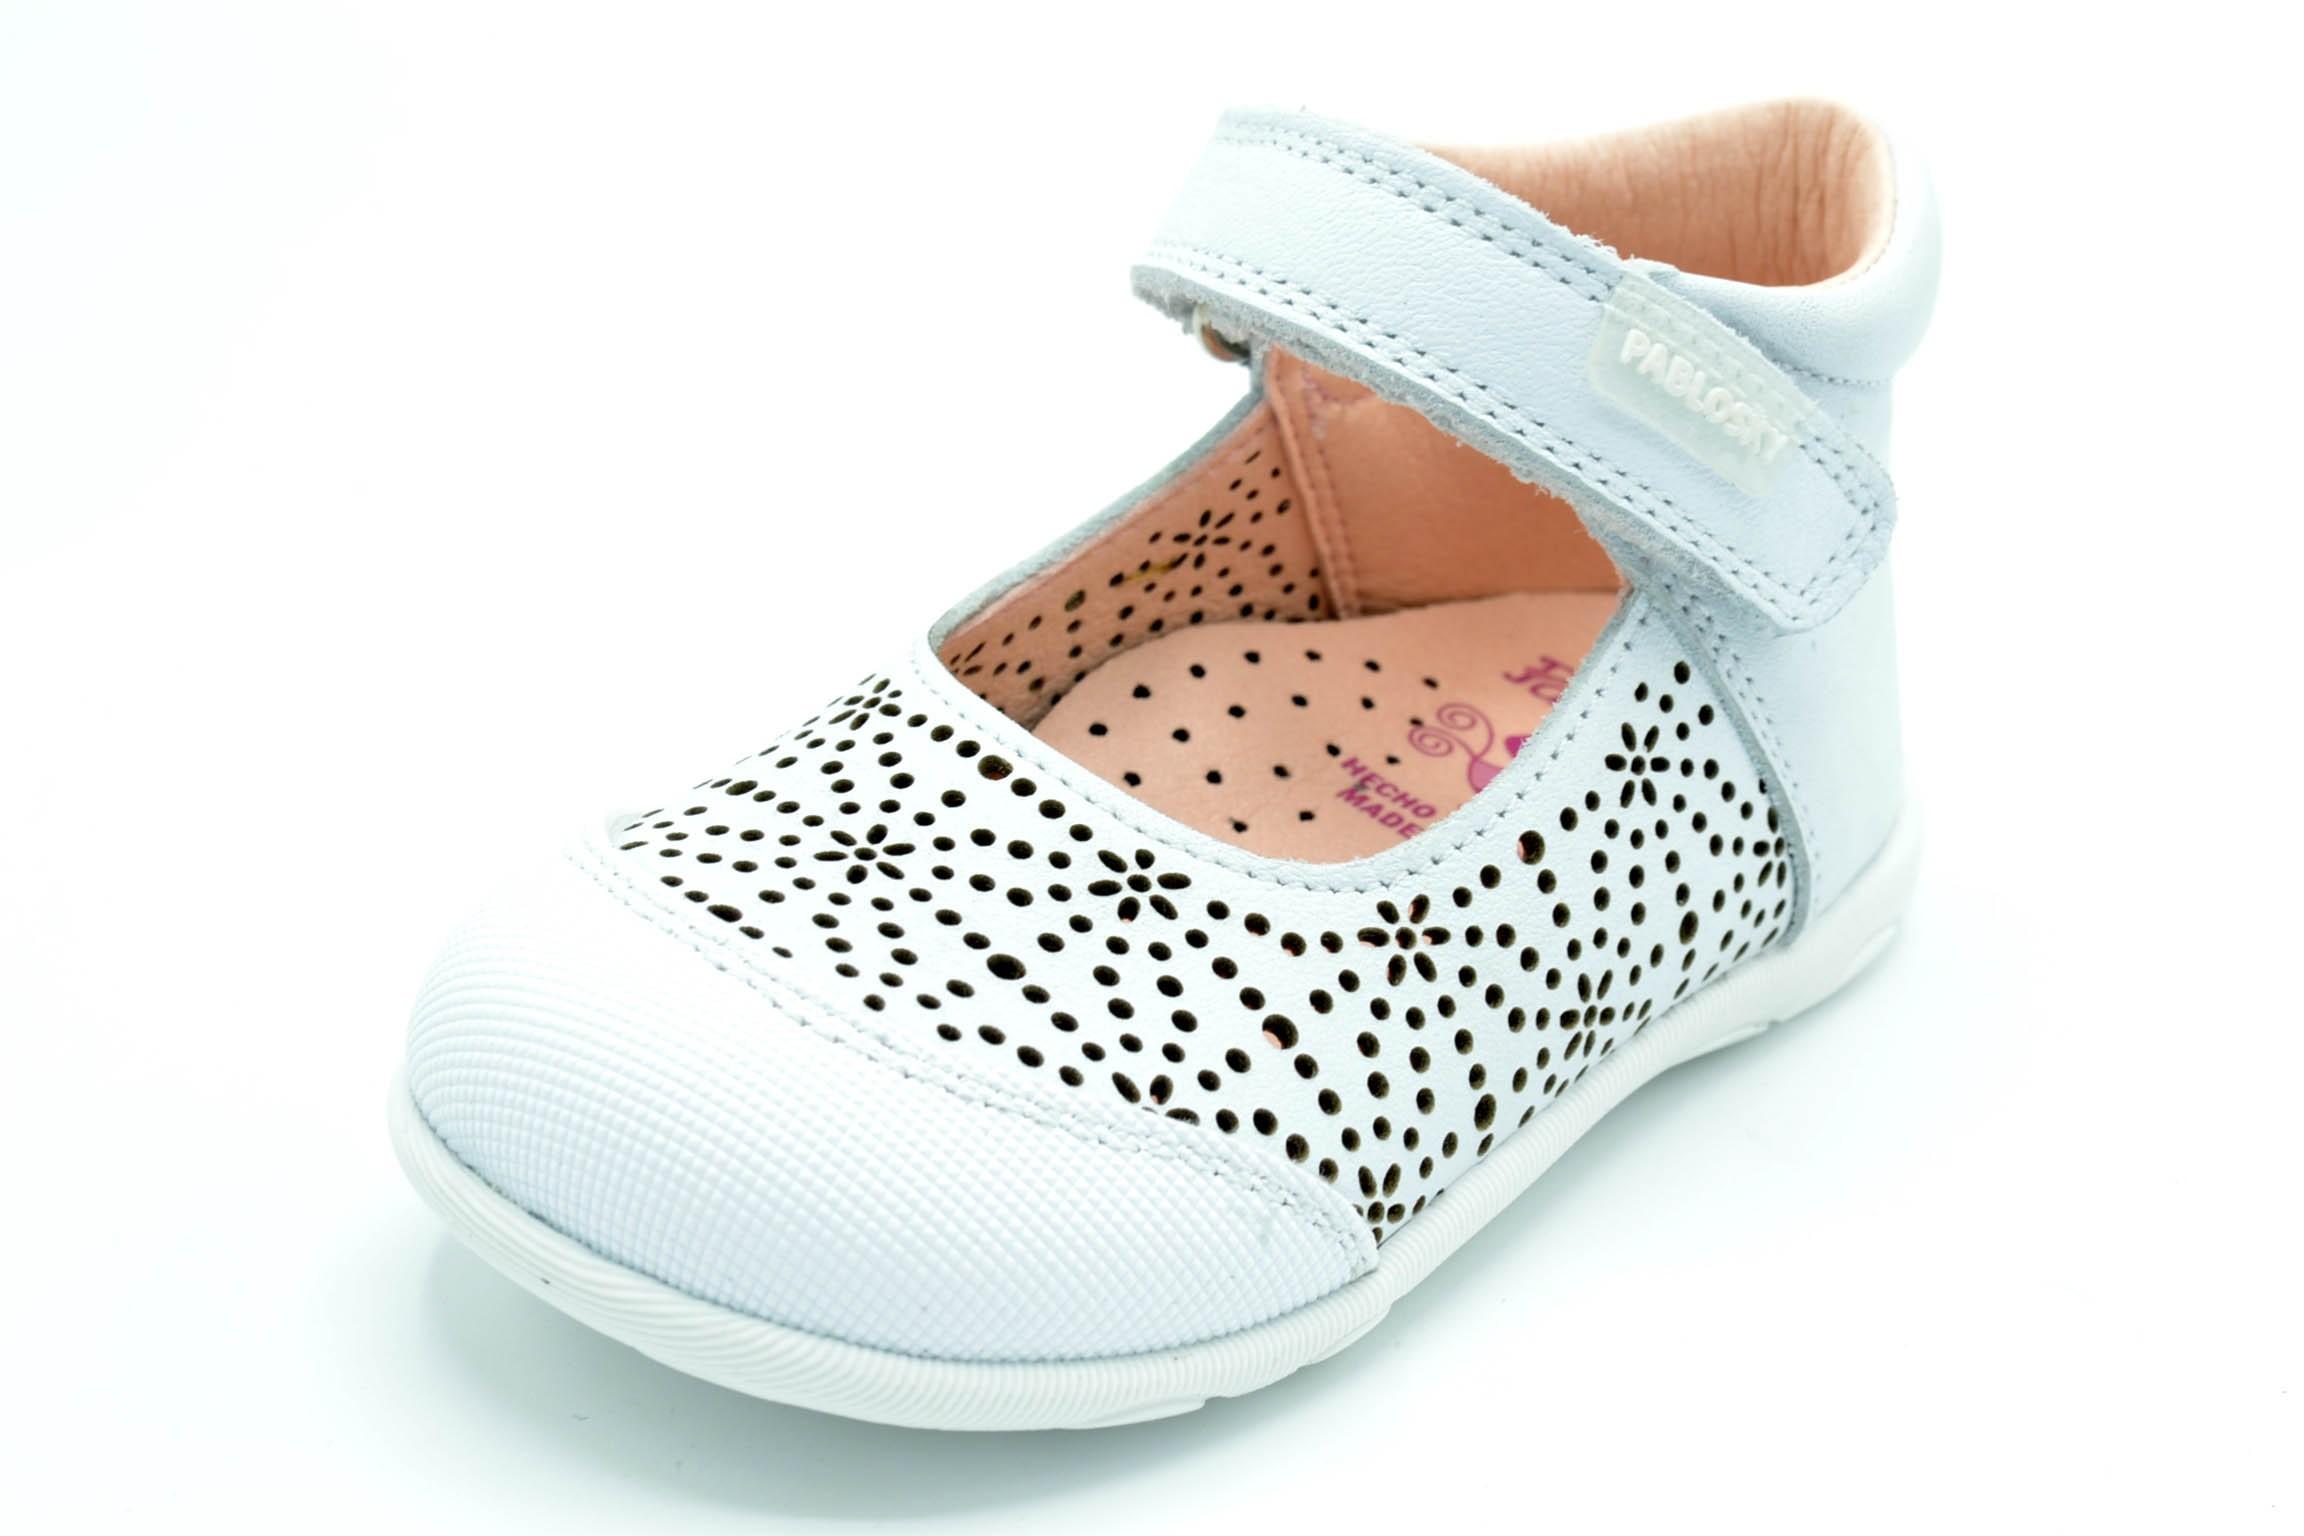 52fa82315 Pablosky 047305 - Zapato de verano primeros pasos